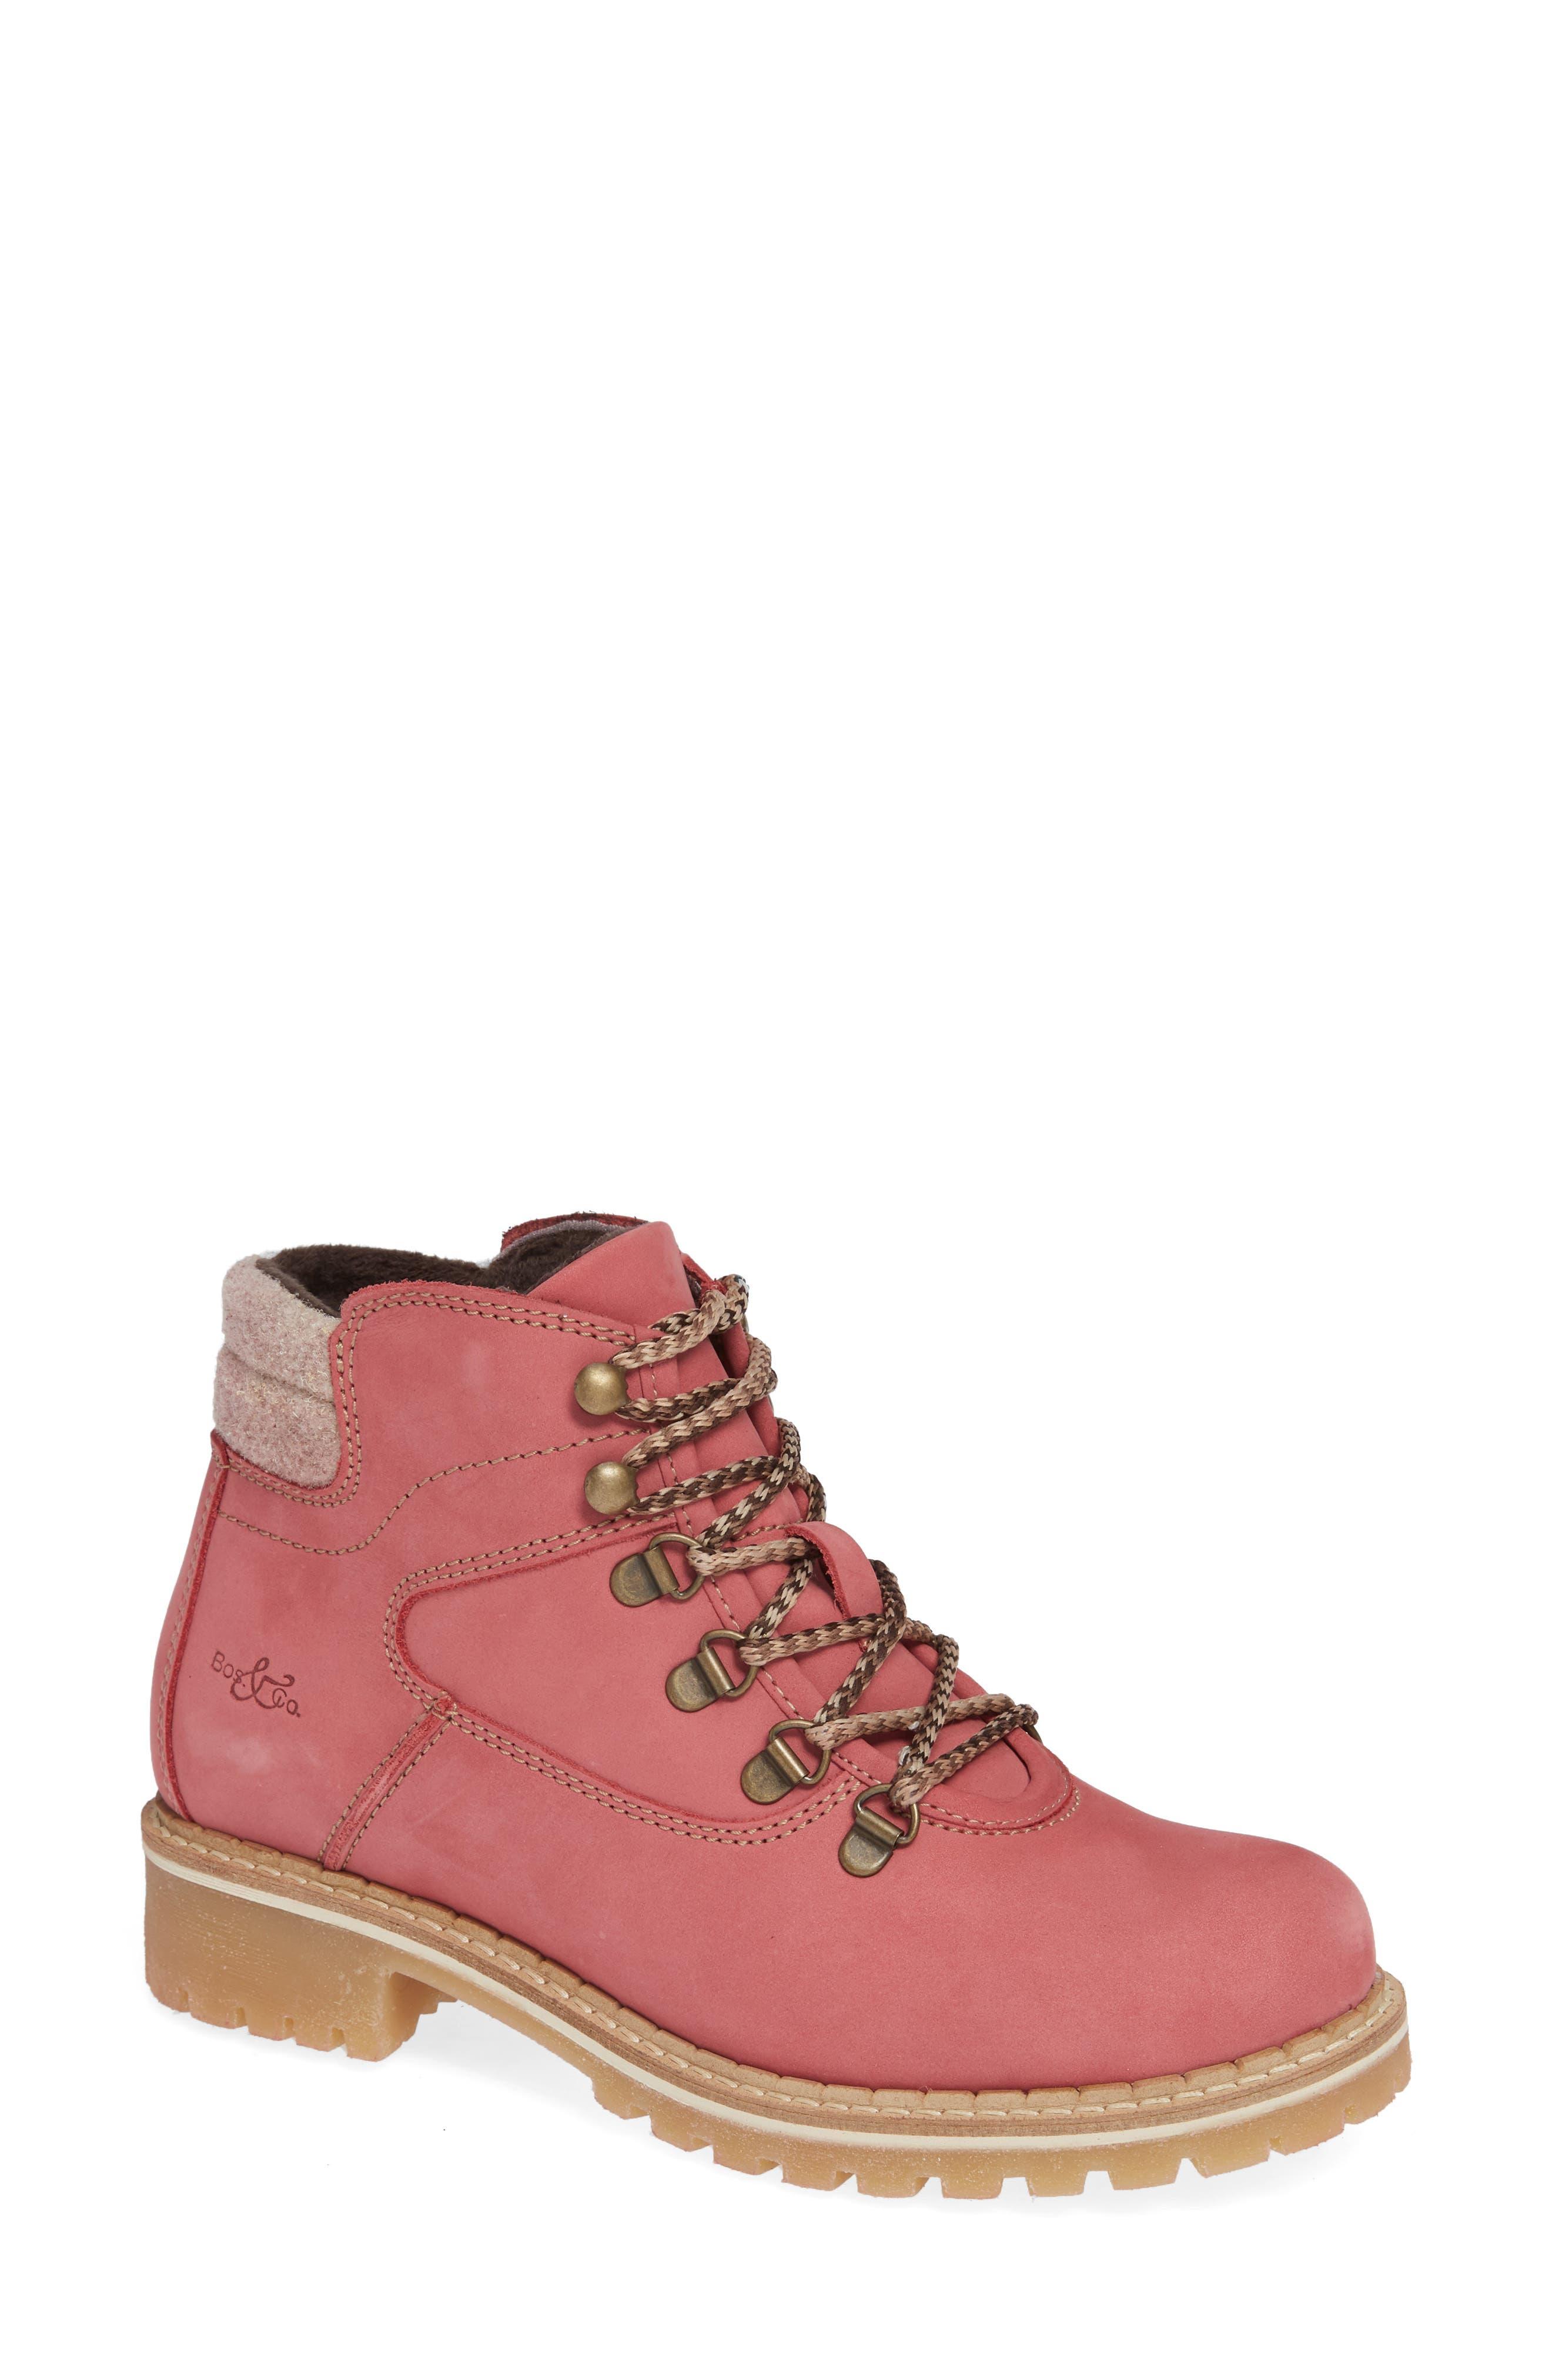 Hartney Waterproof Boot,                         Main,                         color, ROSA WOOL